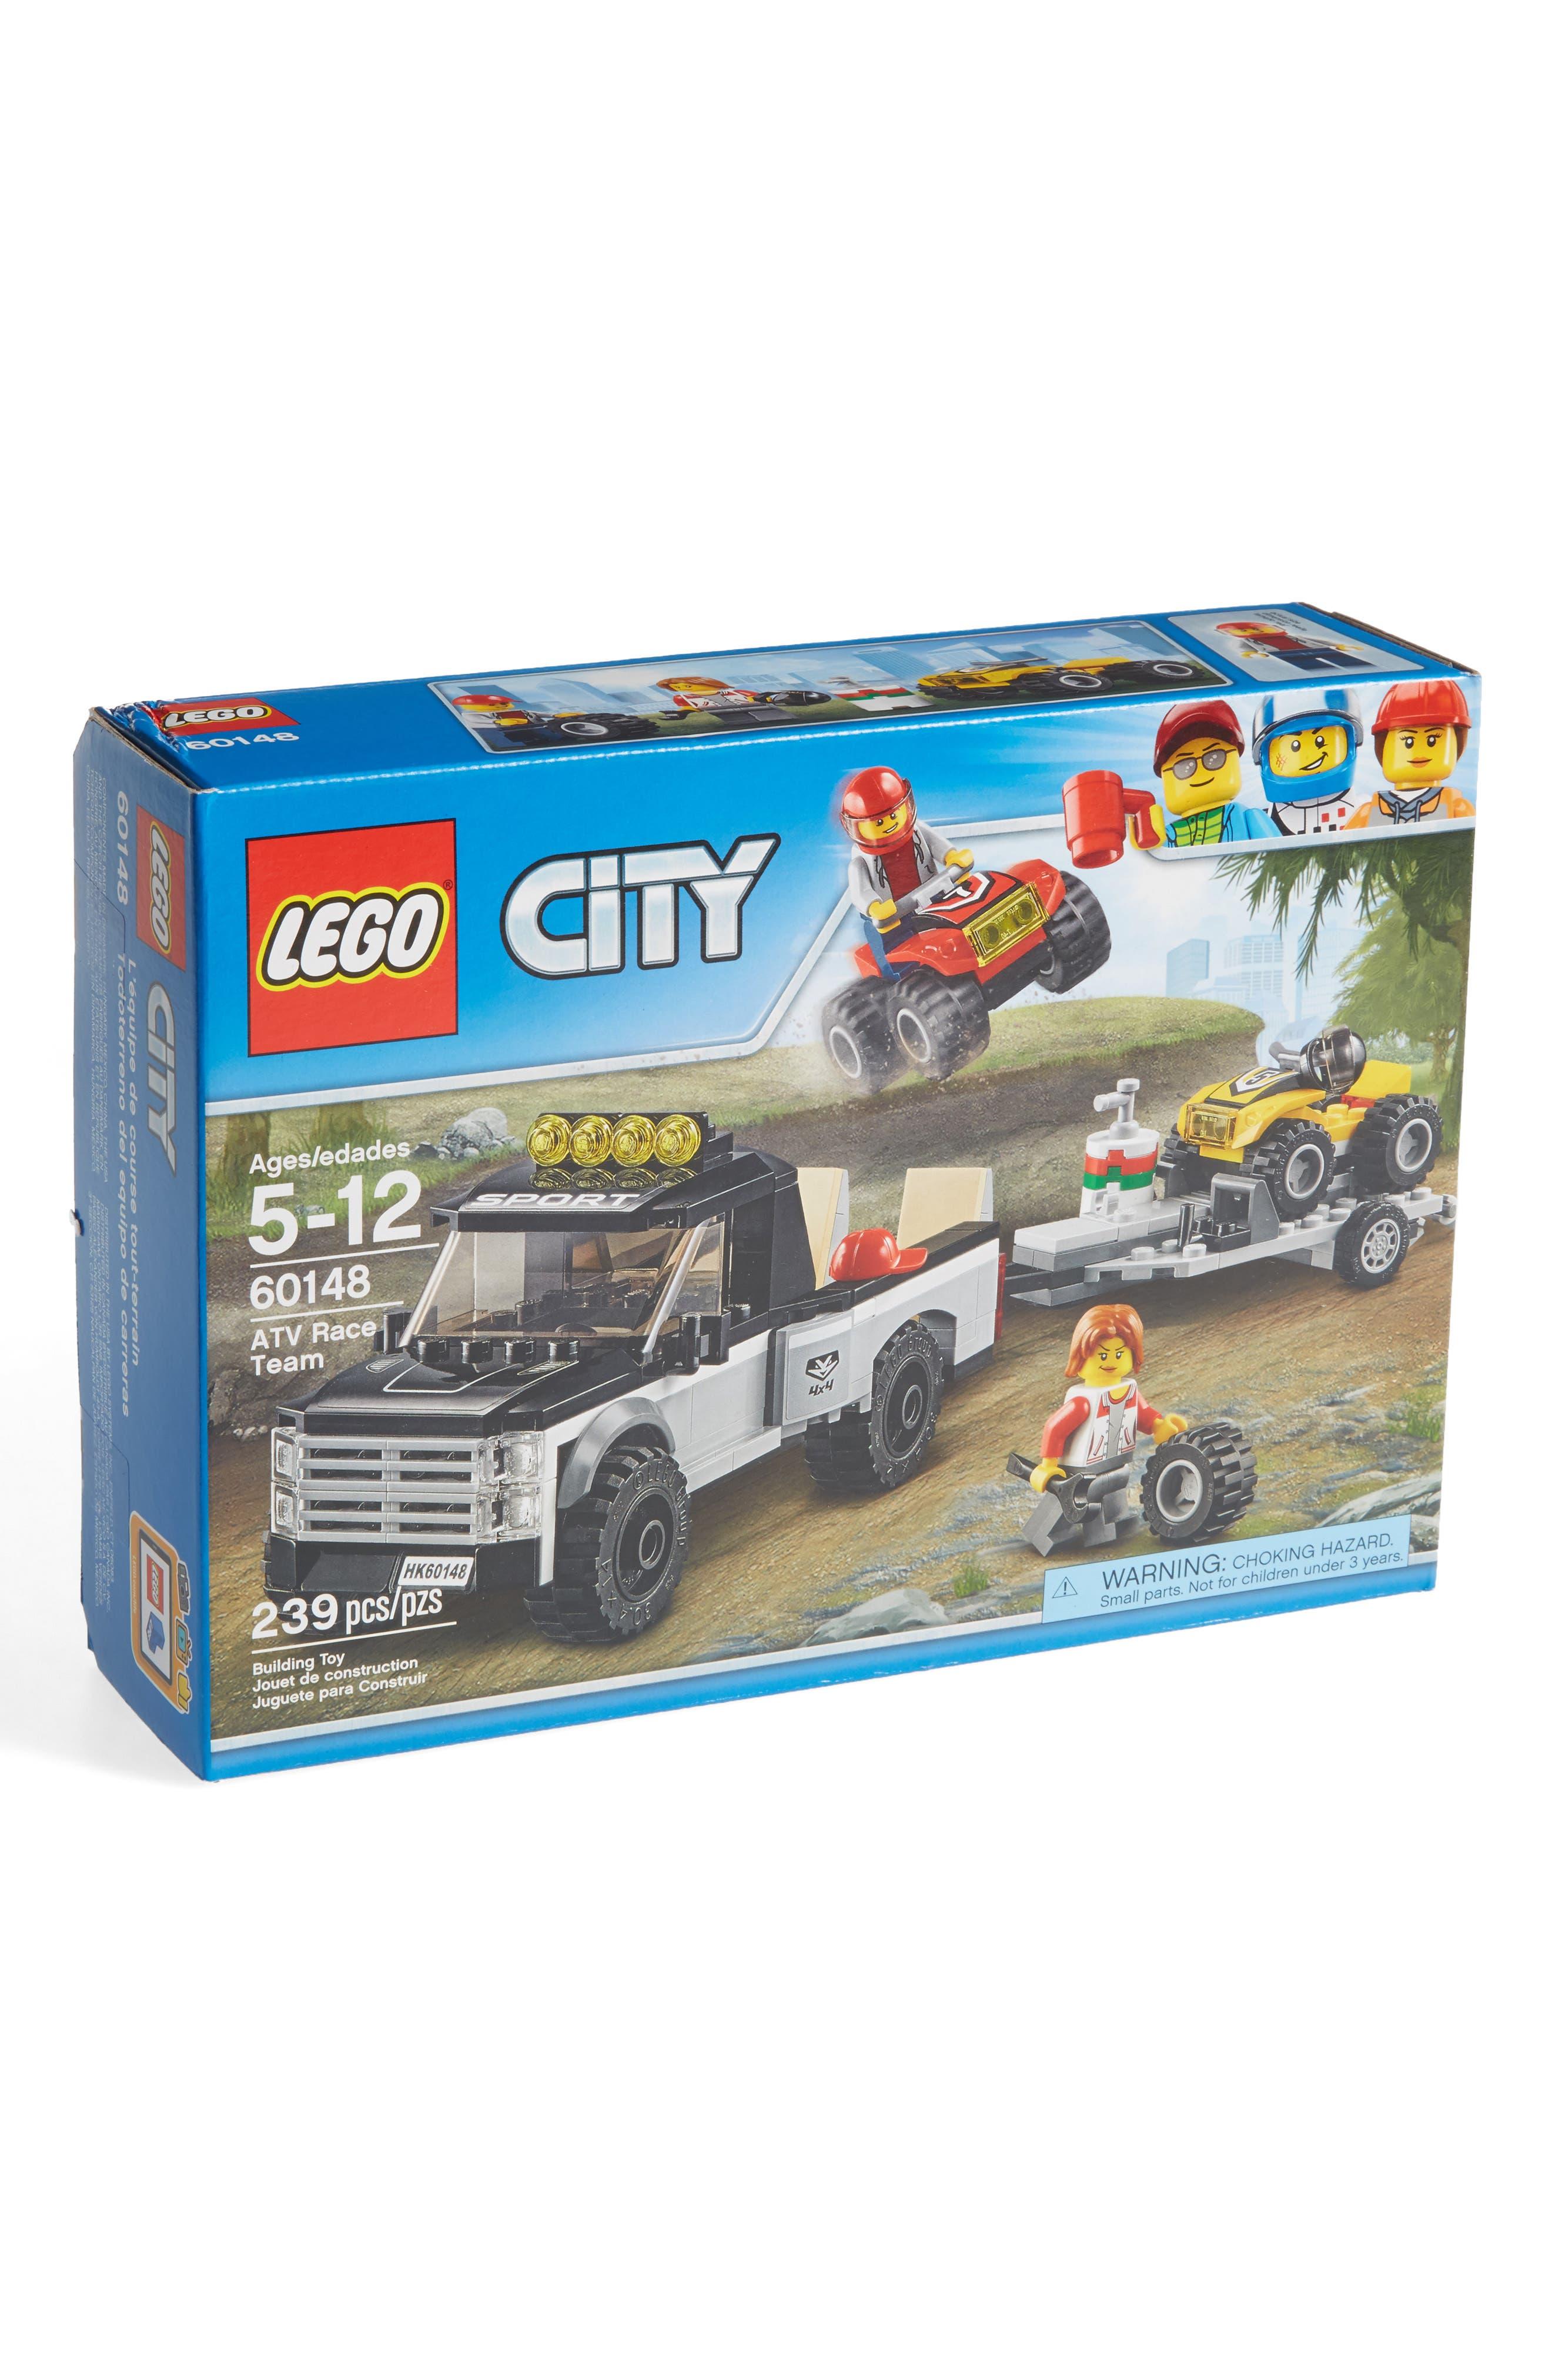 City ATV Race Team - 60148,                             Main thumbnail 1, color,                             400